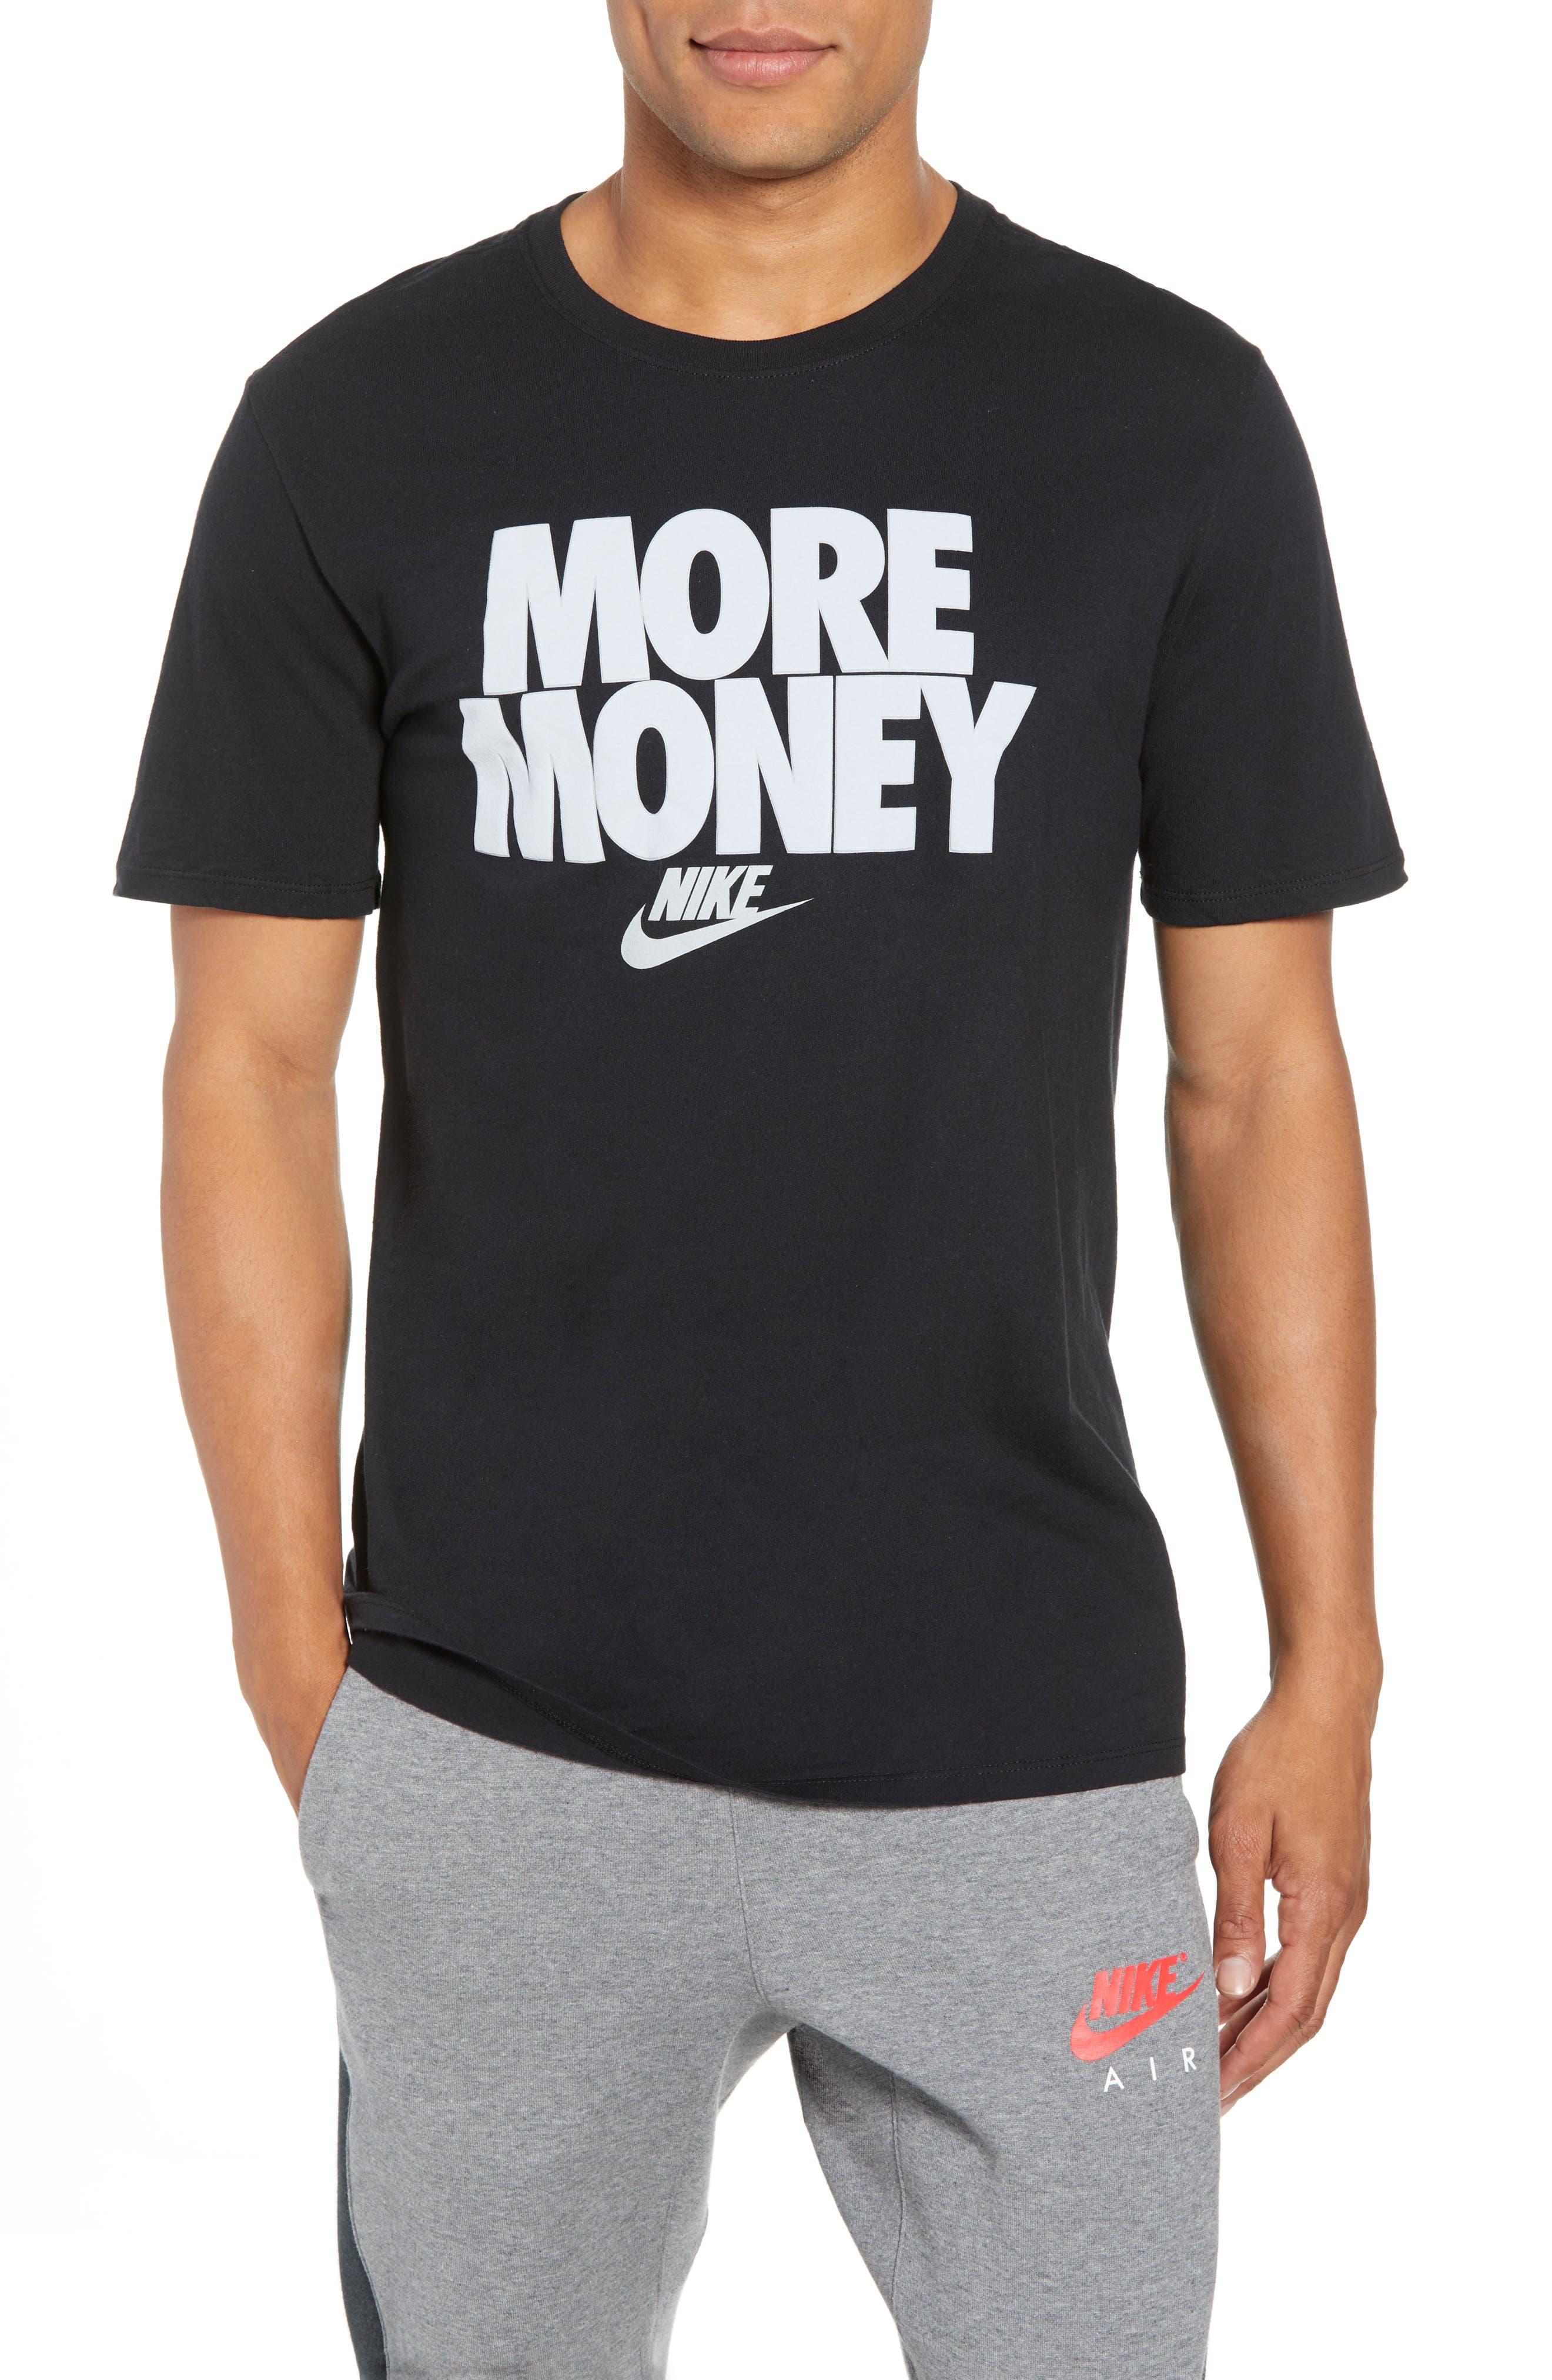 NIKE Sportswear More Money T-Shirt, Main, color, 010